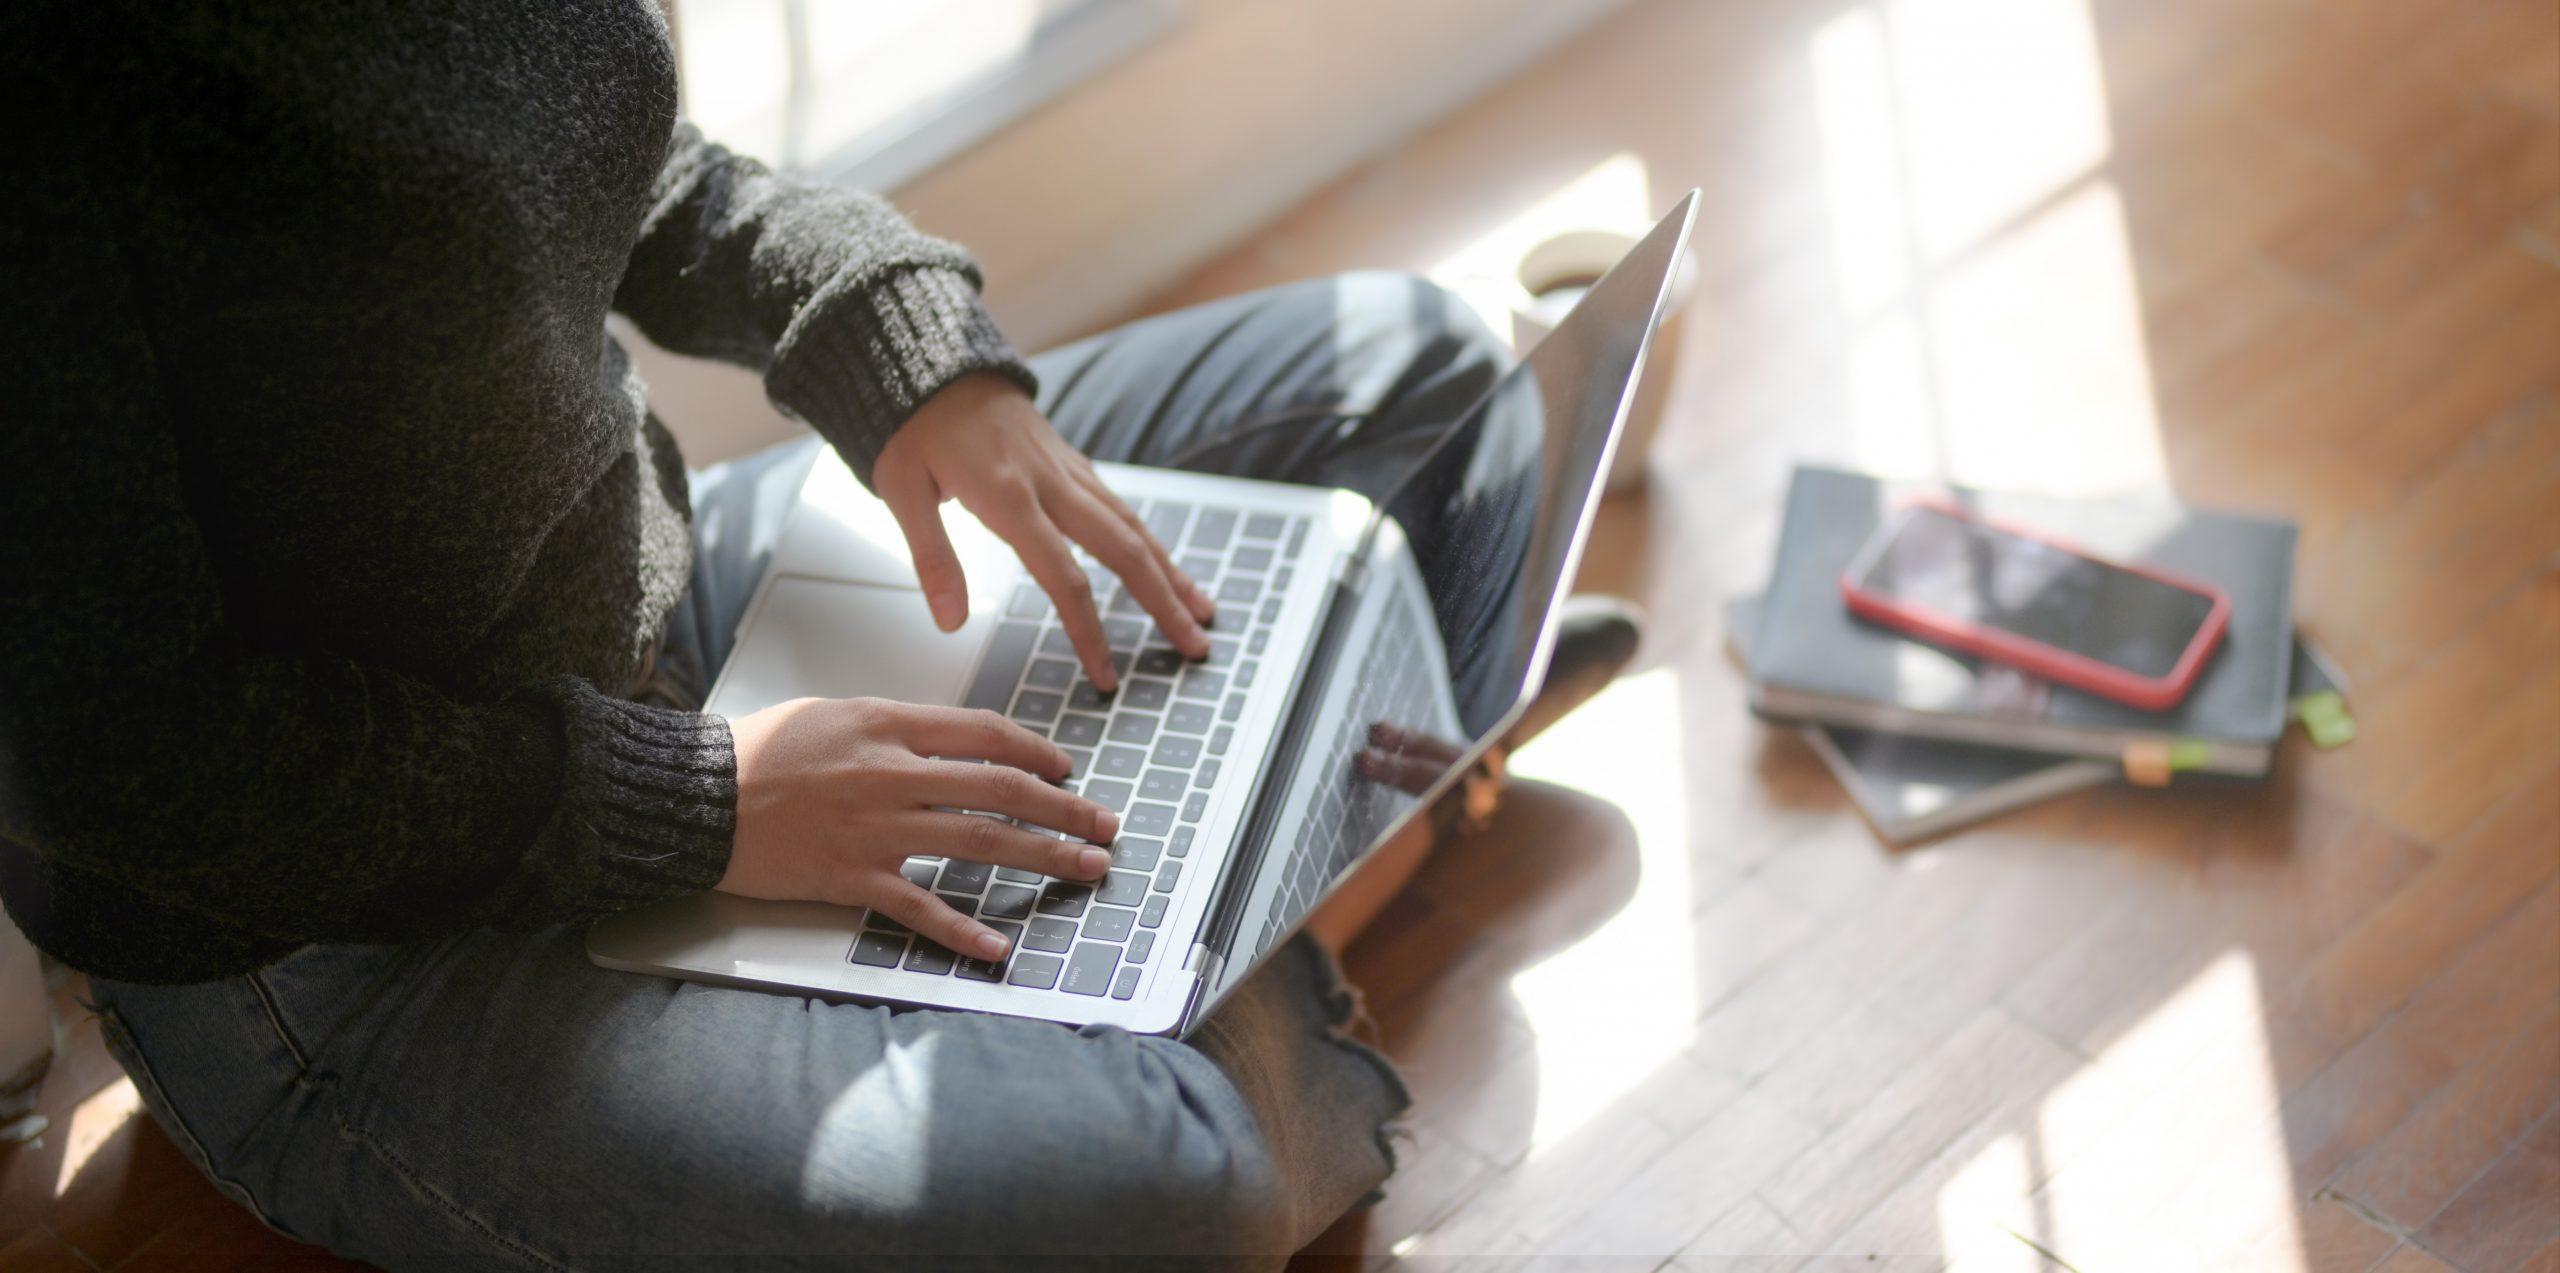 woman-sitting-on-the-floor-using-laptop-3759057